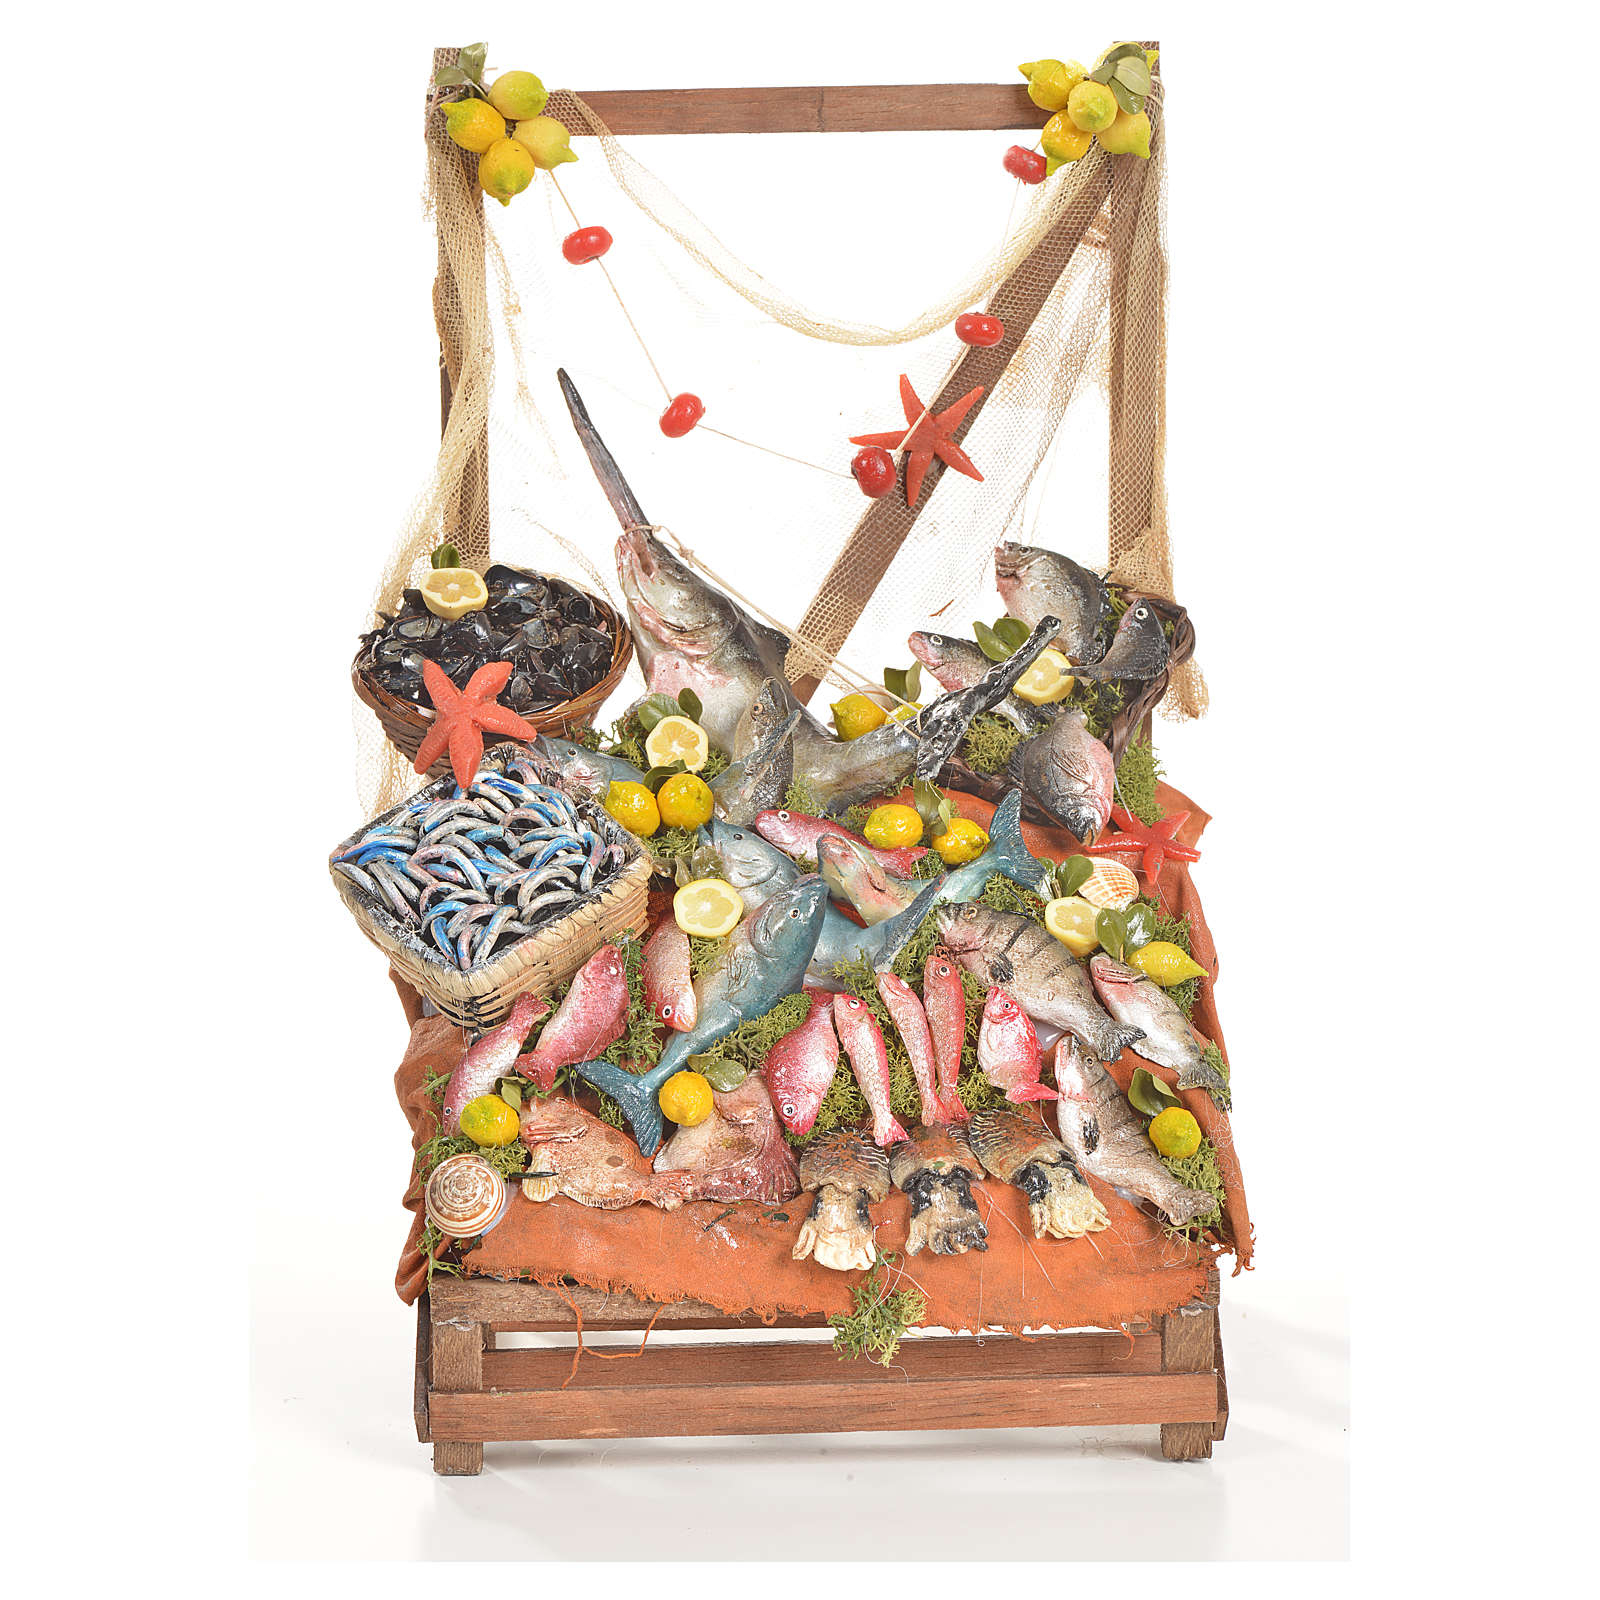 Nativity accessory, fishmonger's stall 20x22x40cm 4